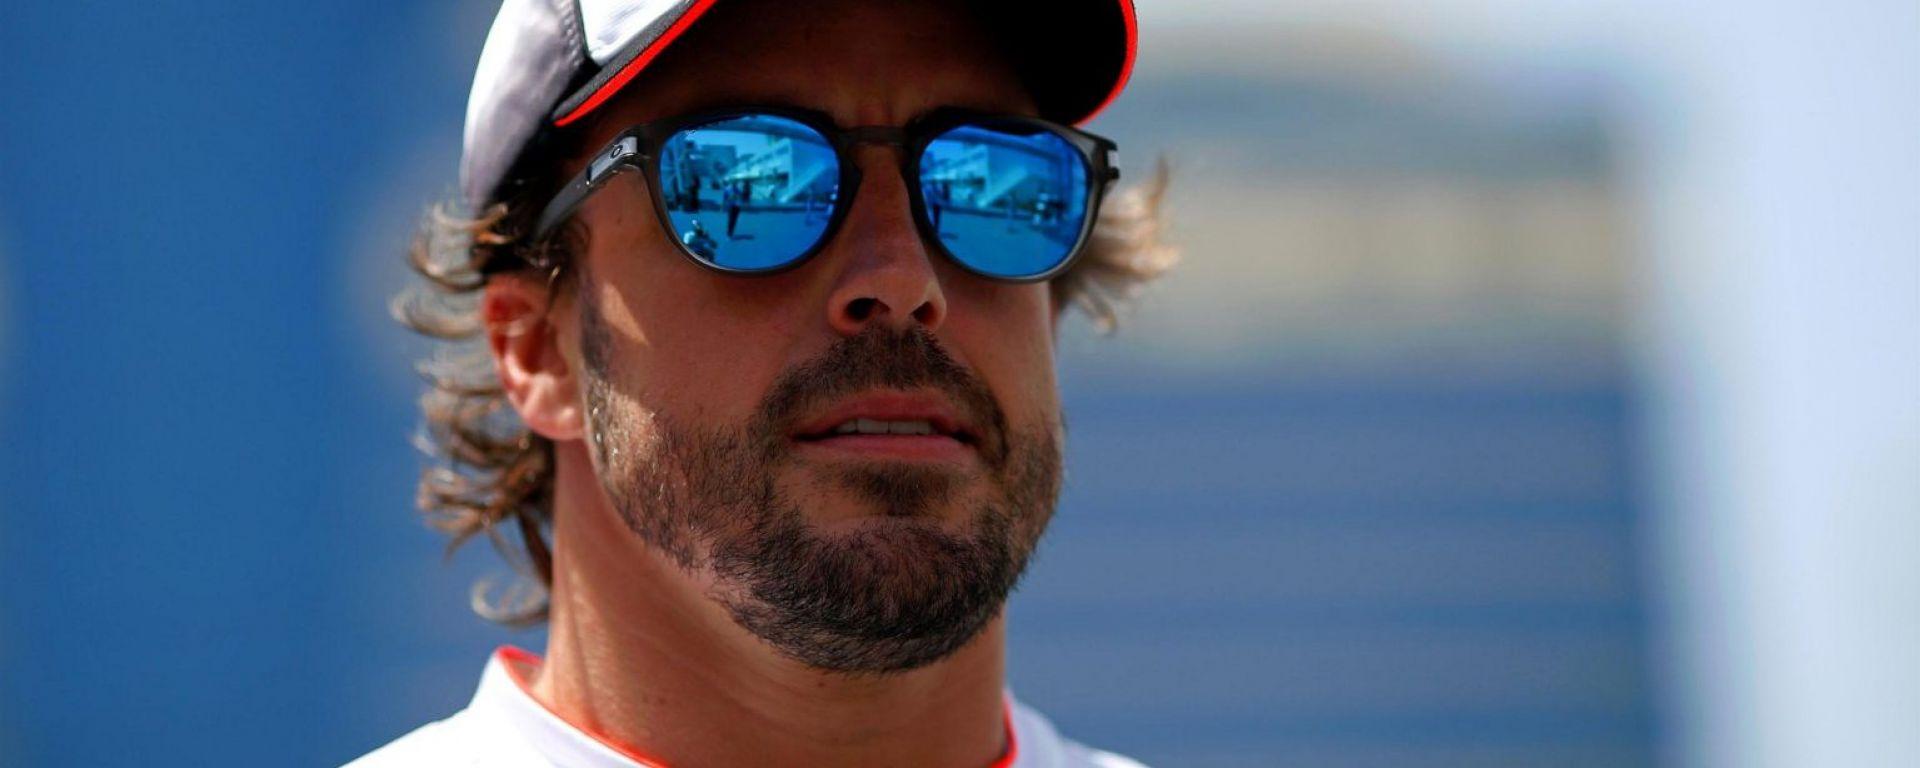 Fernando Alonso outside Baku Street Circuit